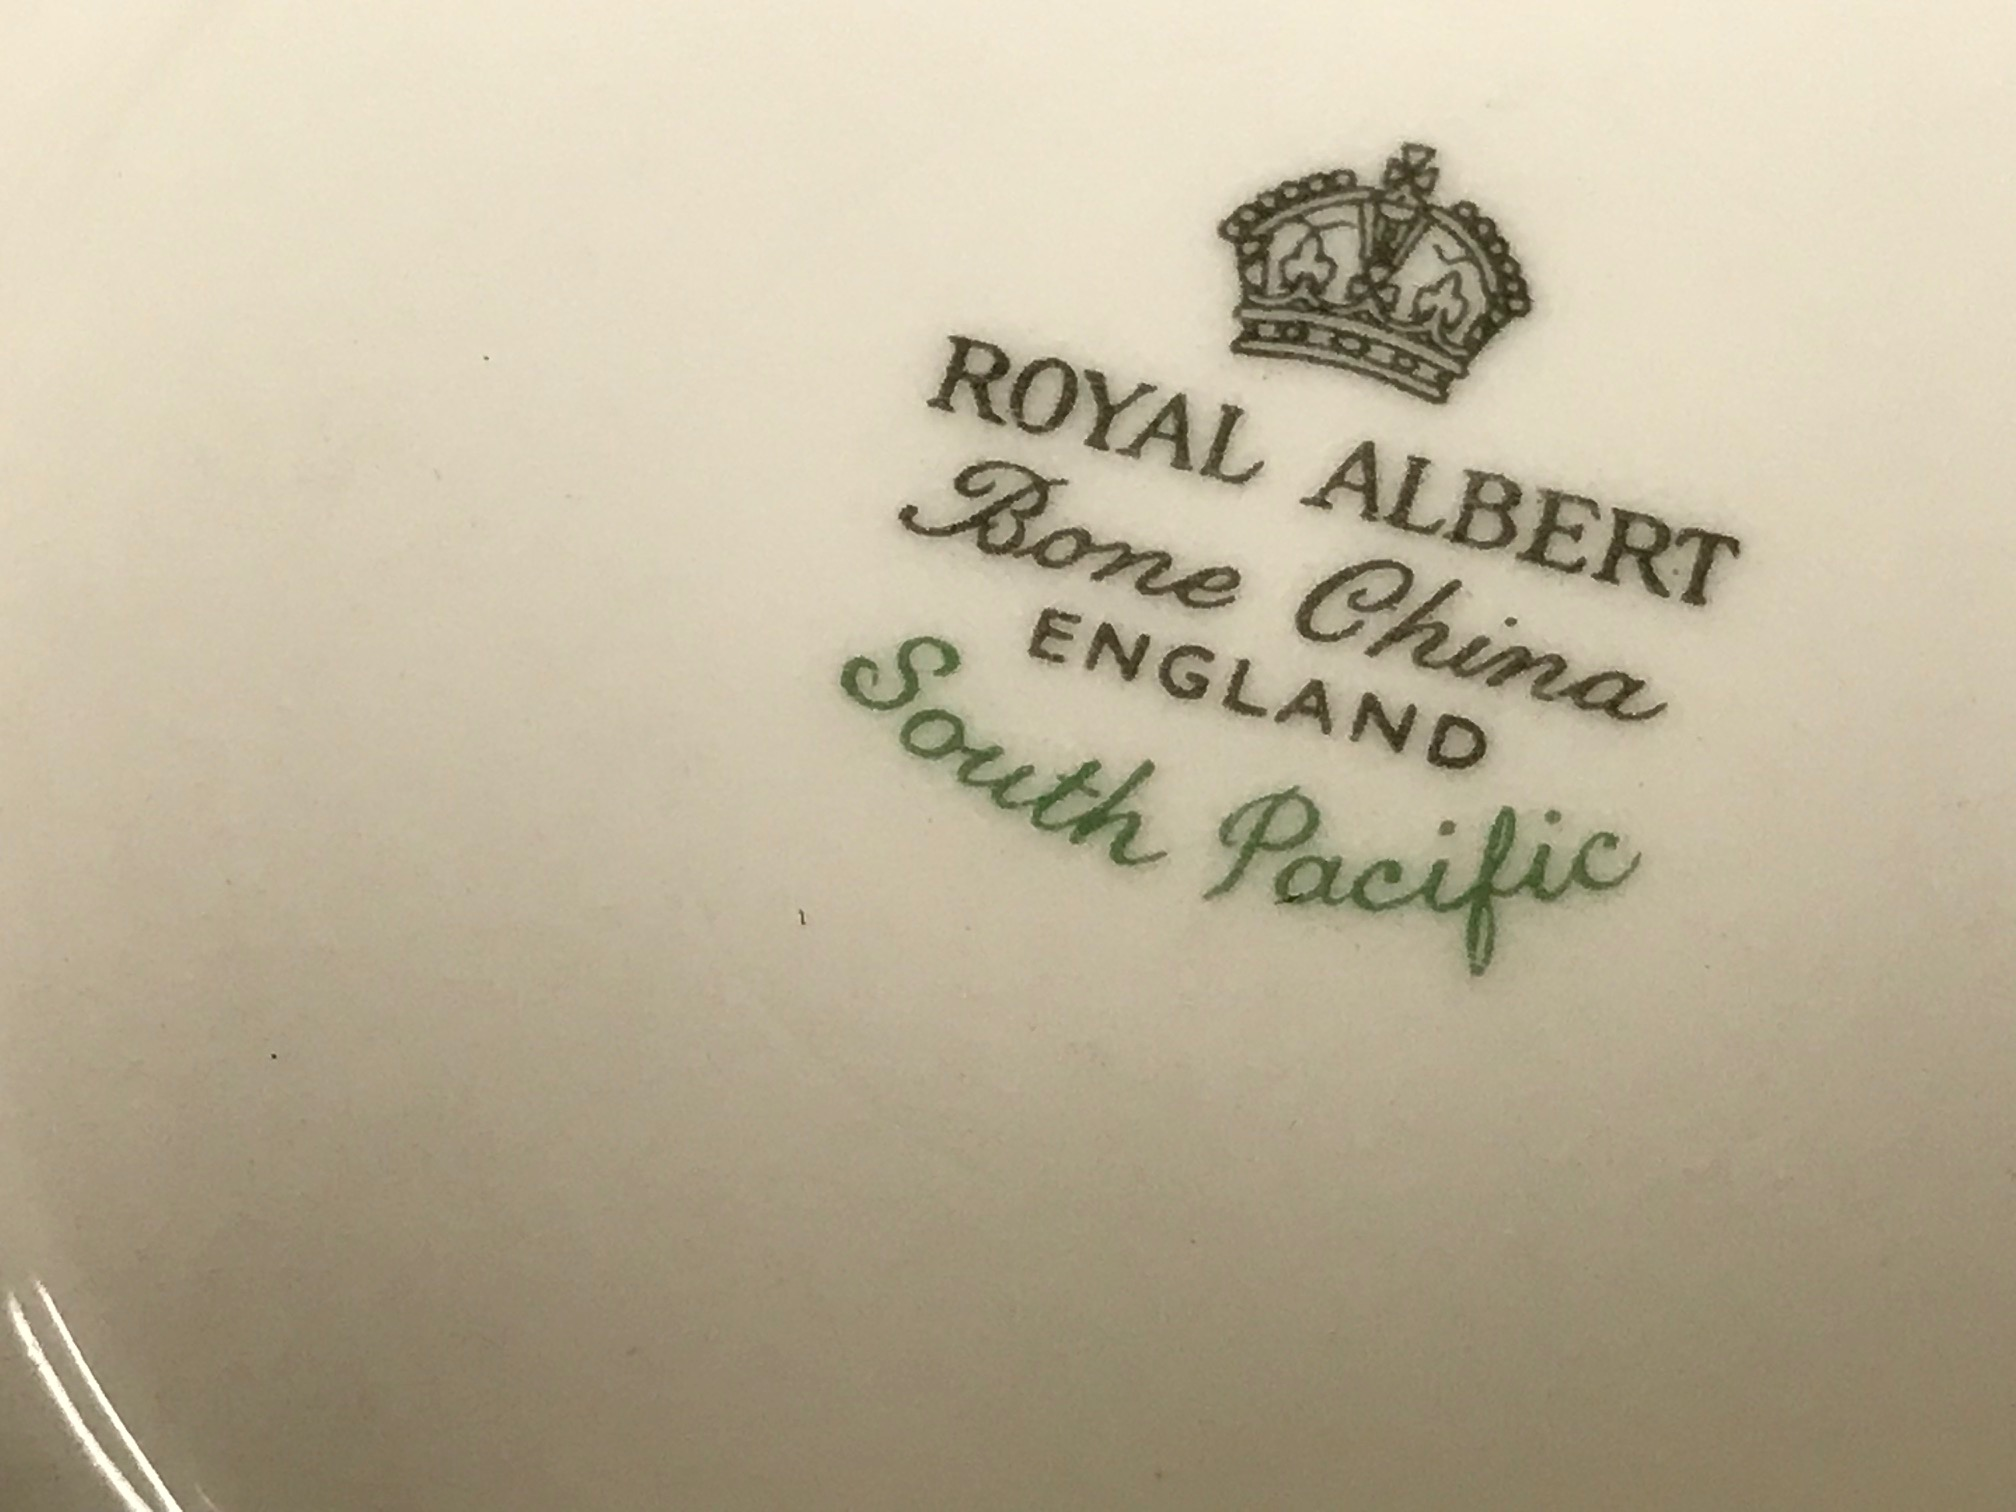 Royal Albert South Pacific Bone China: 53,300 ppm Lead + Cadmium